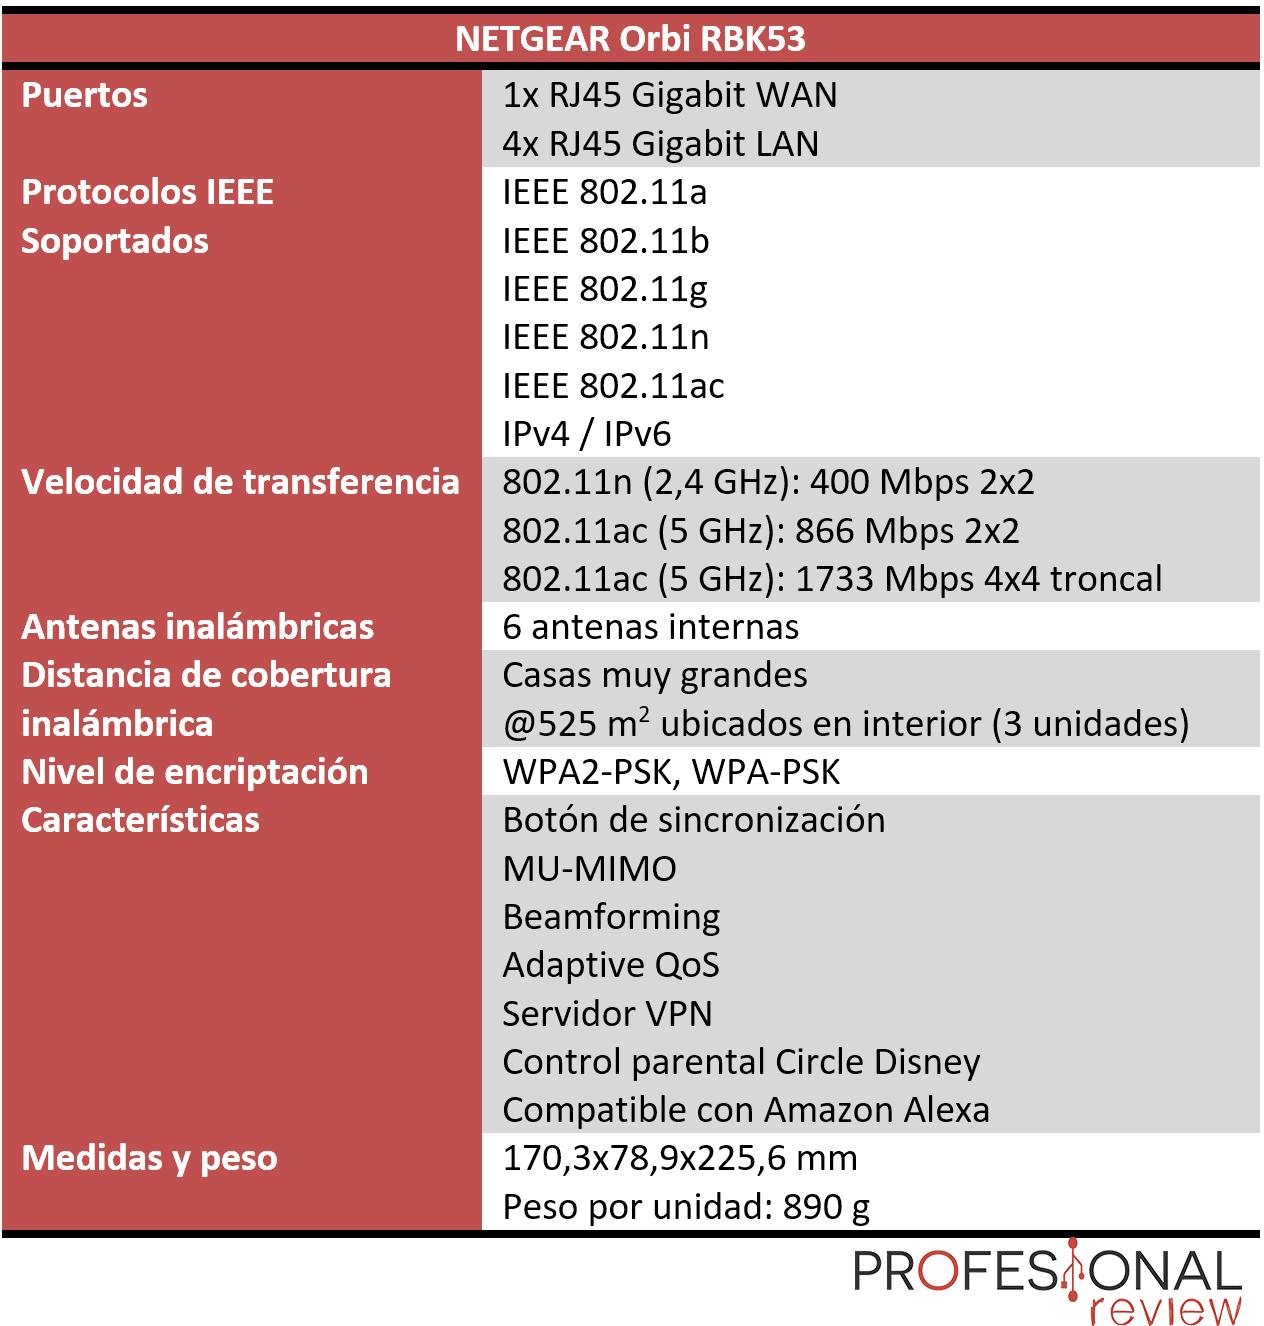 NETGEAR Orbi RBK53 Características